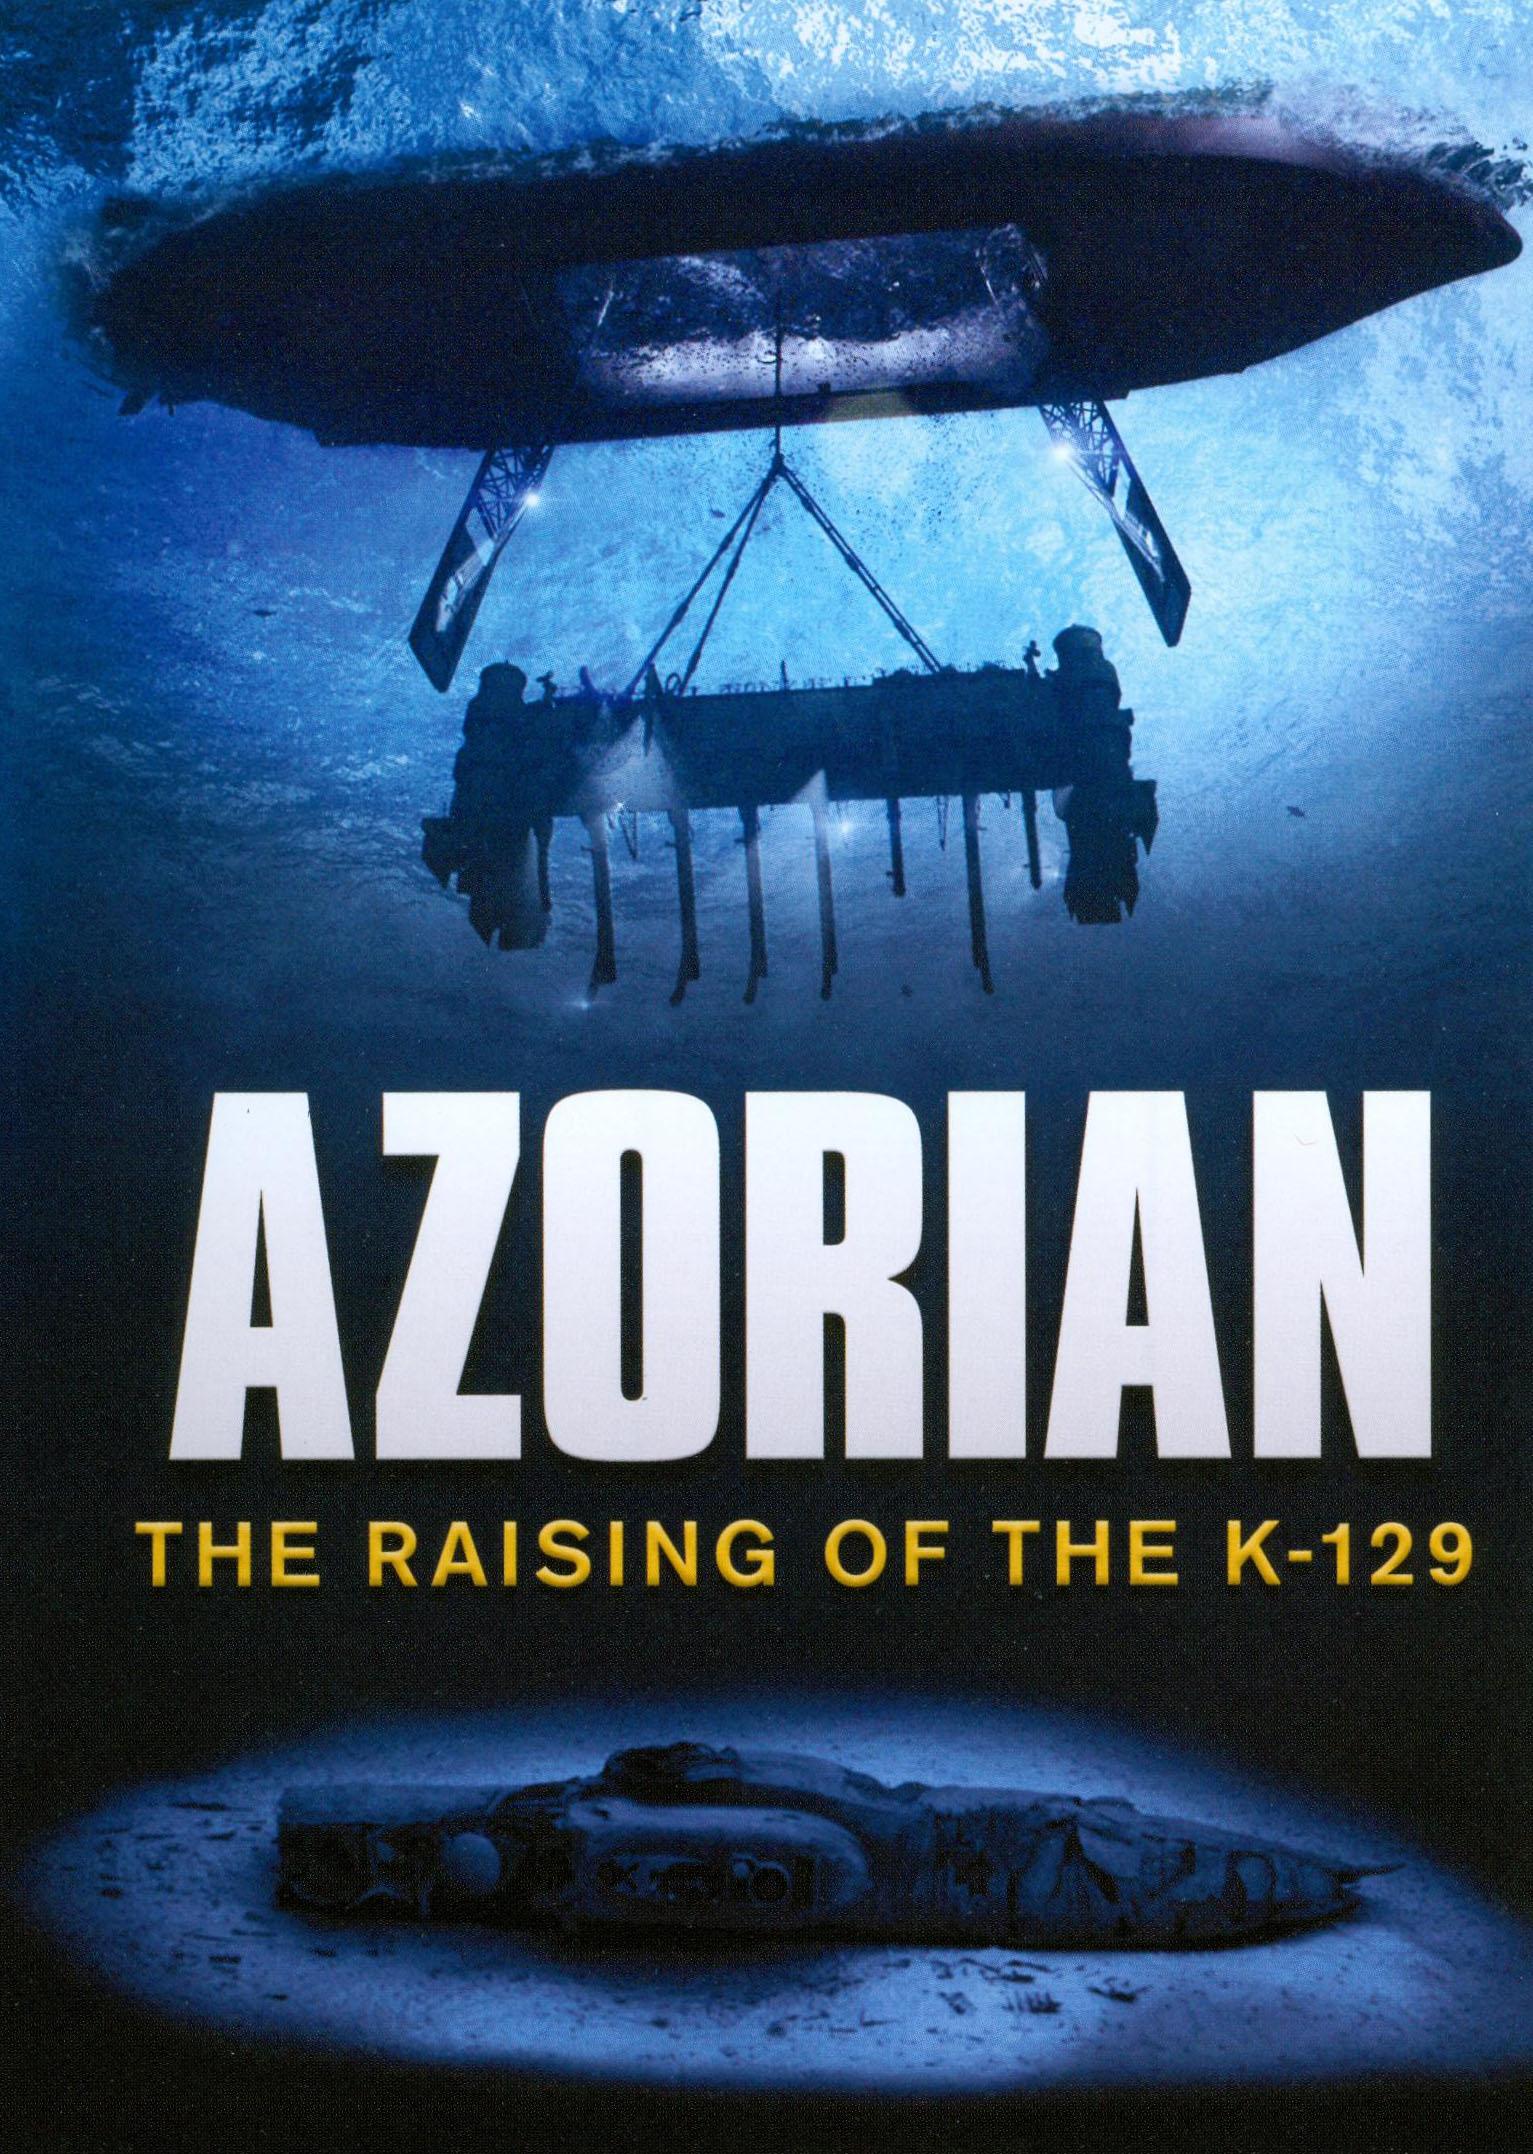 Azorian: The Raising of the K